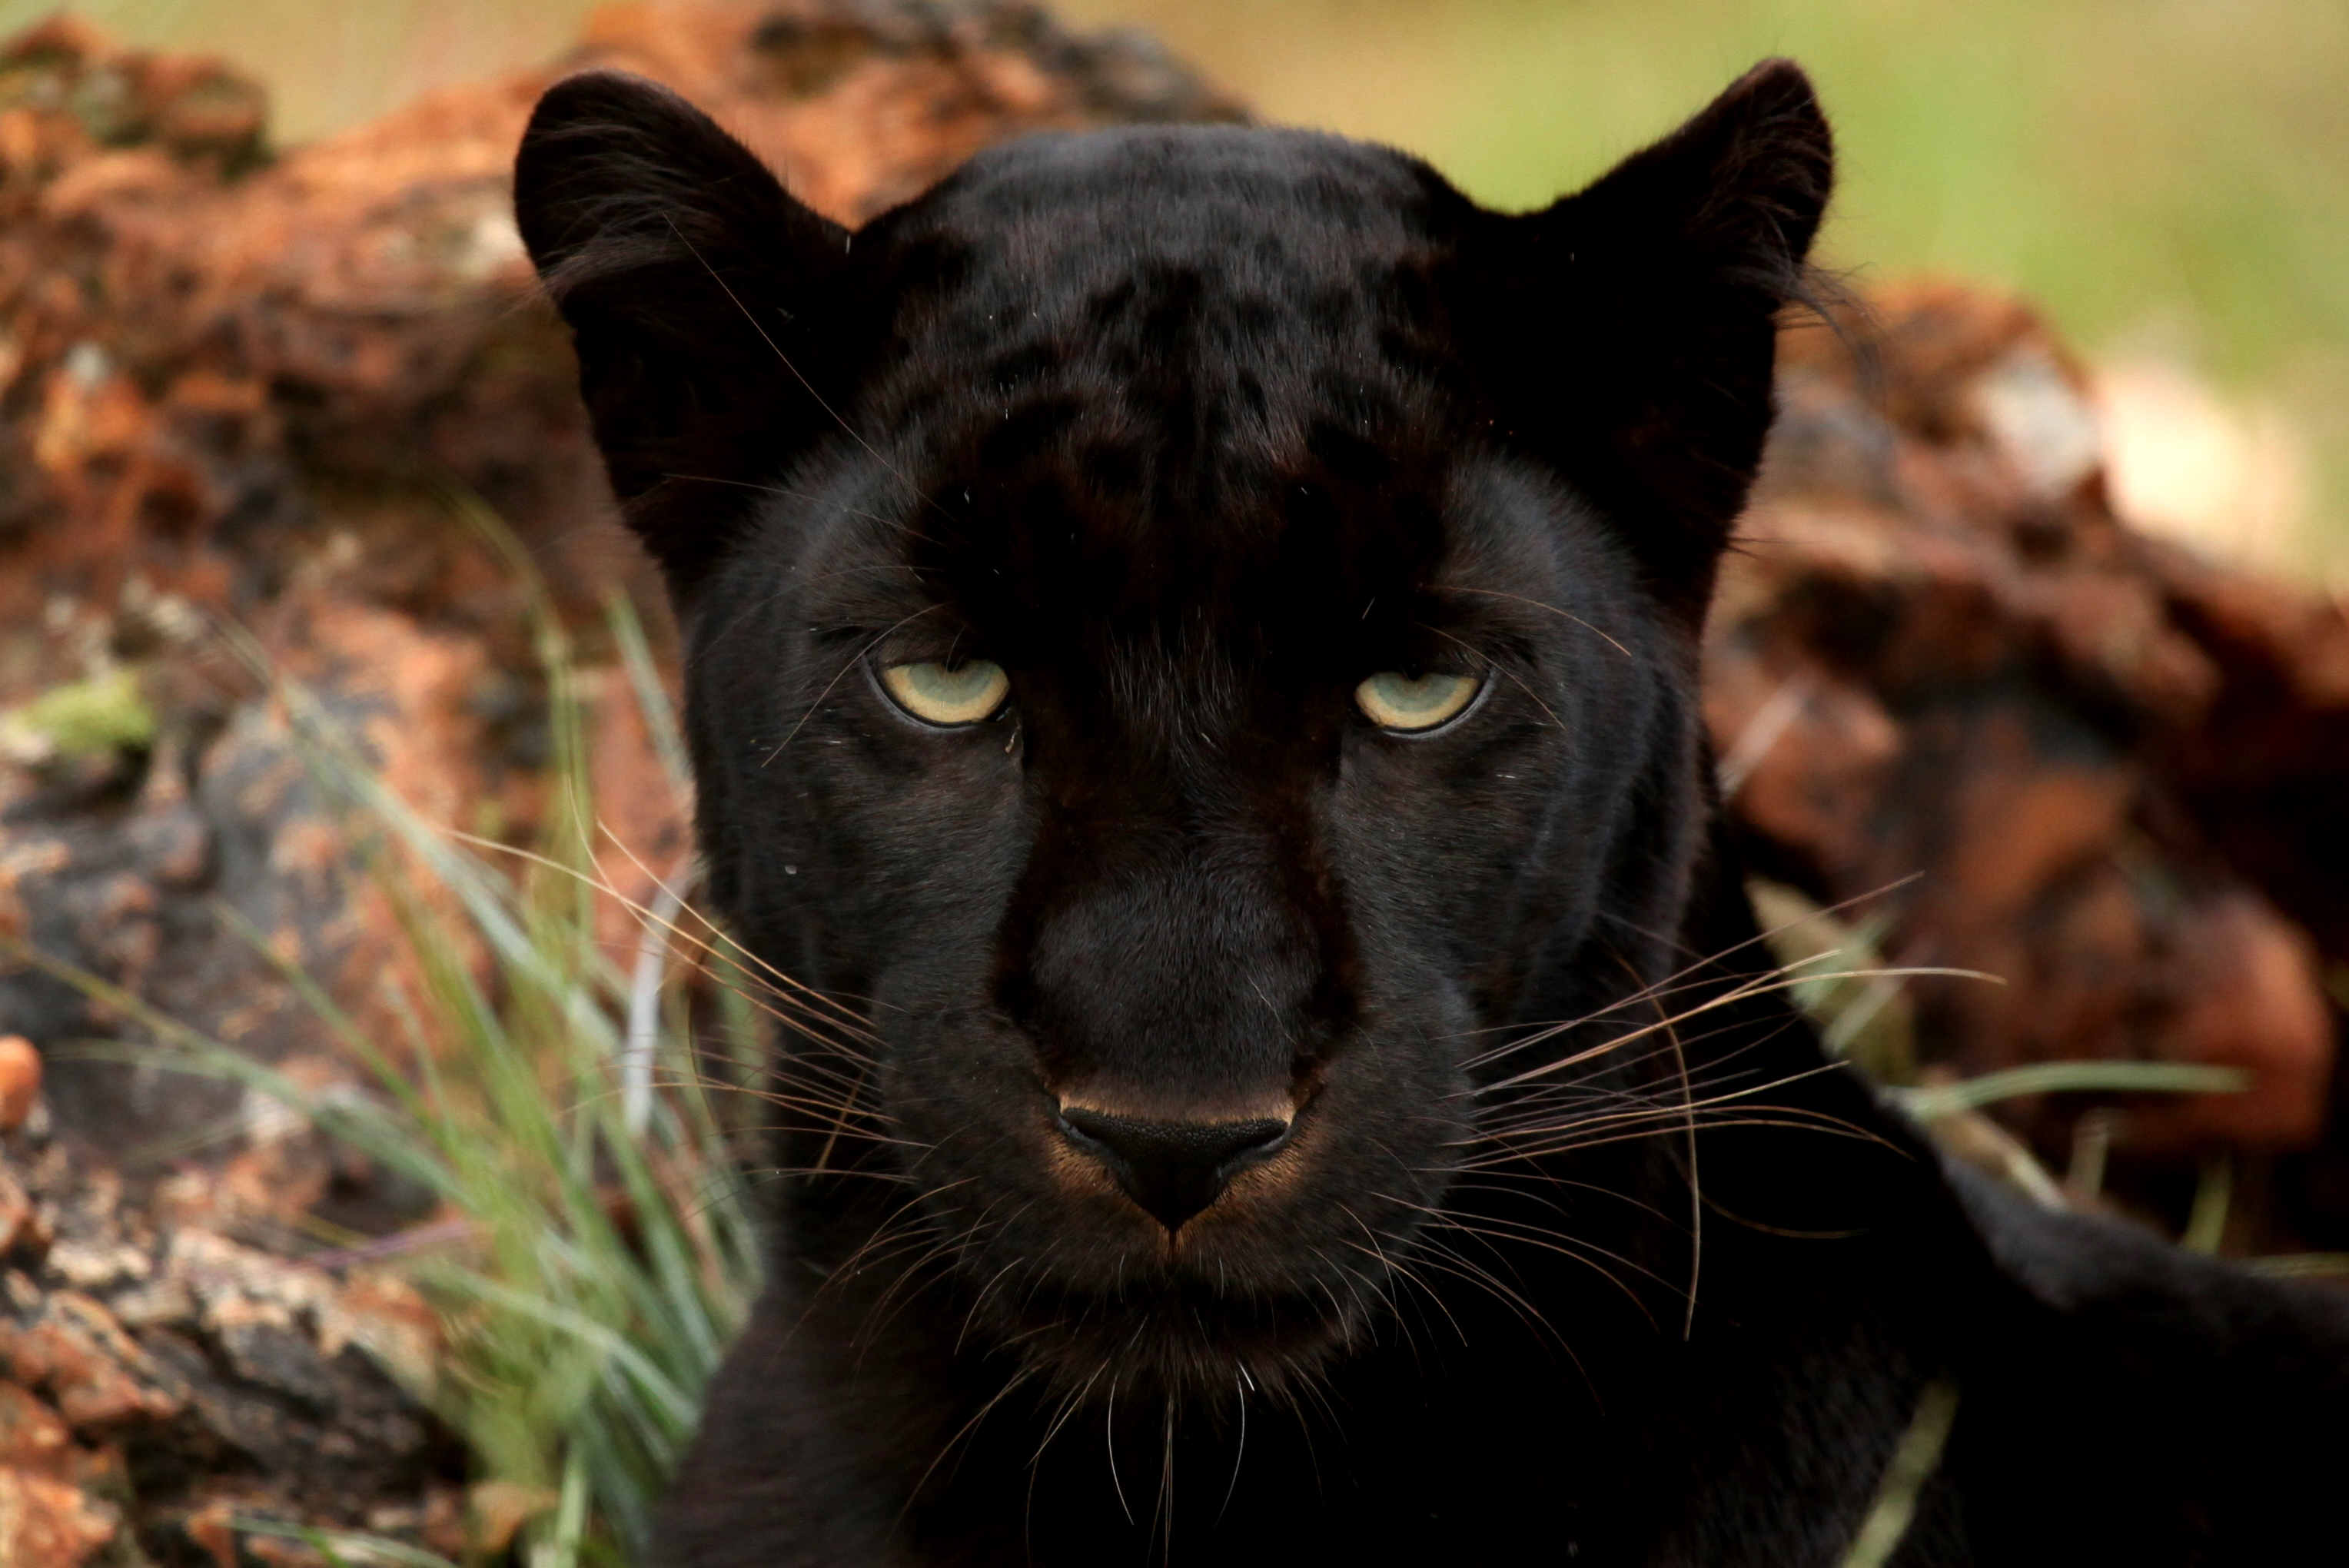 Description Black PantherJPG 3056x2040